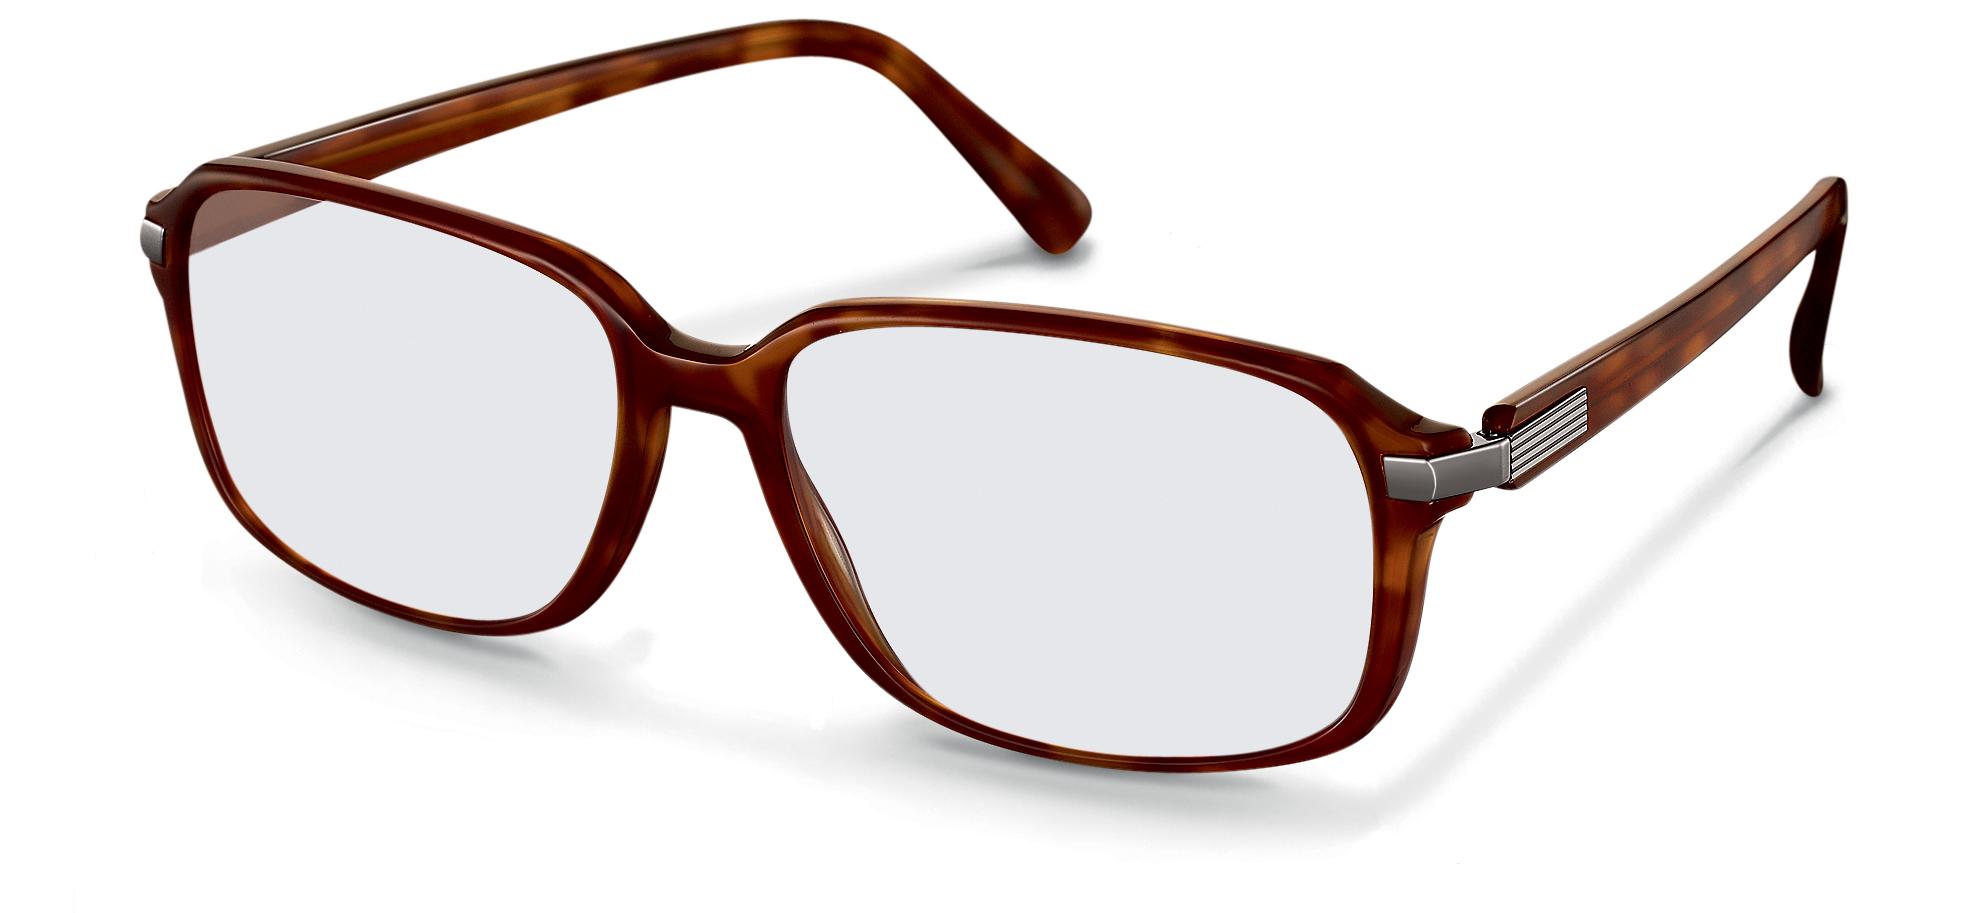 Easyclip Replacement Clip-Ons Eyeglasses - Discount Designer